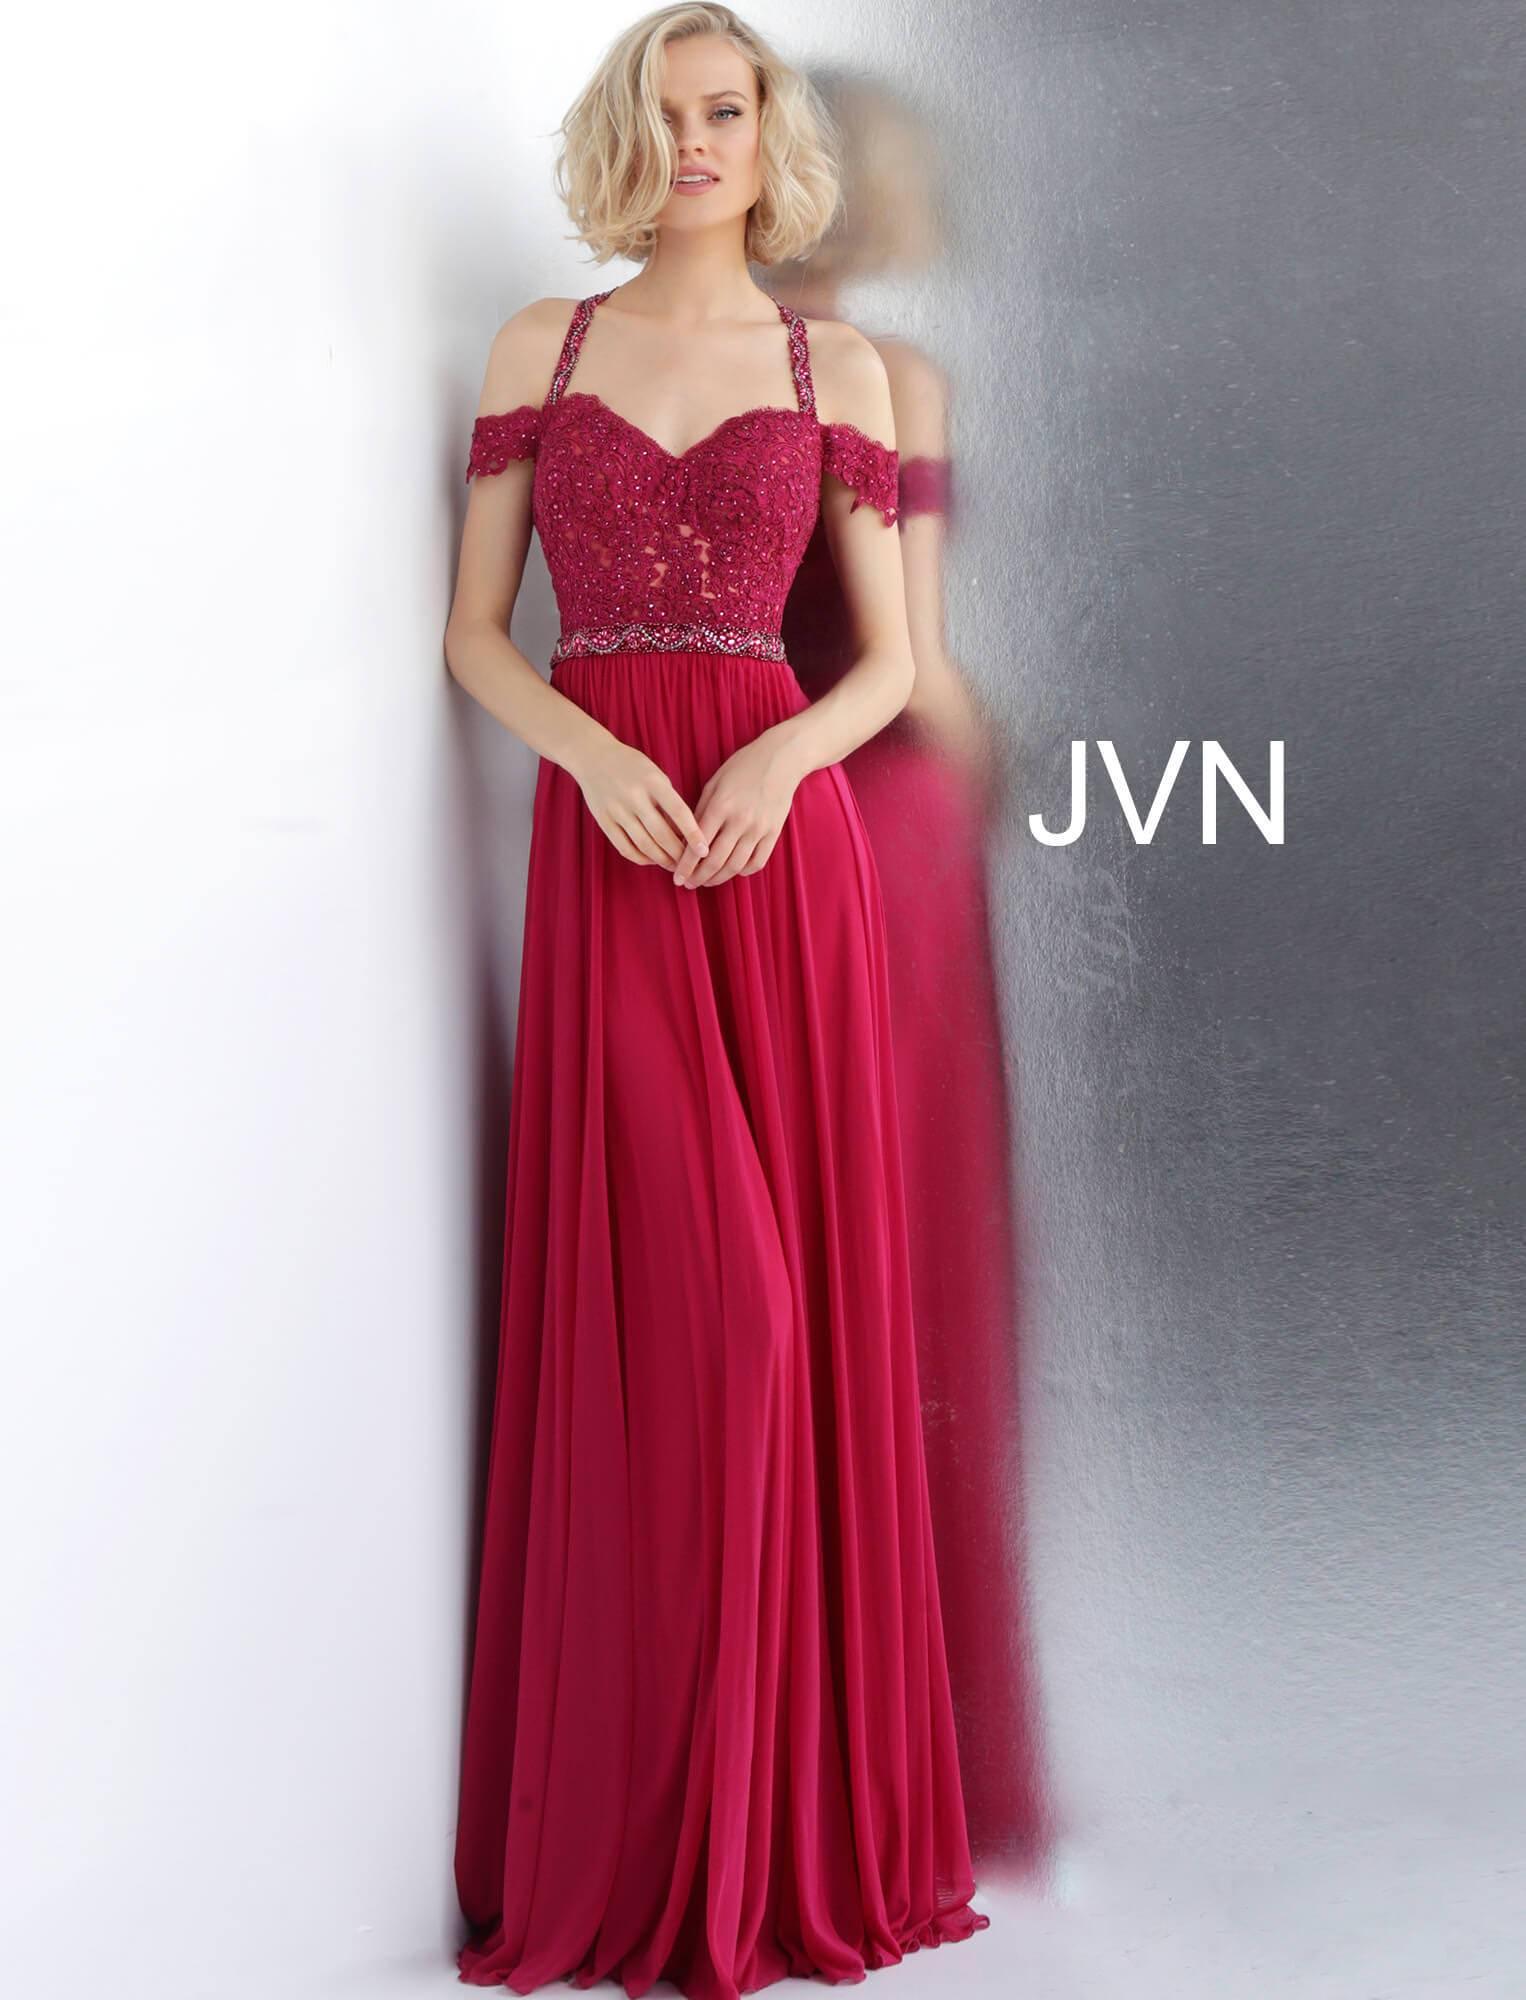 72ab6d937064 Jovani jvn68269 - Off the Shoulder Long Flowing Chiffon Dress